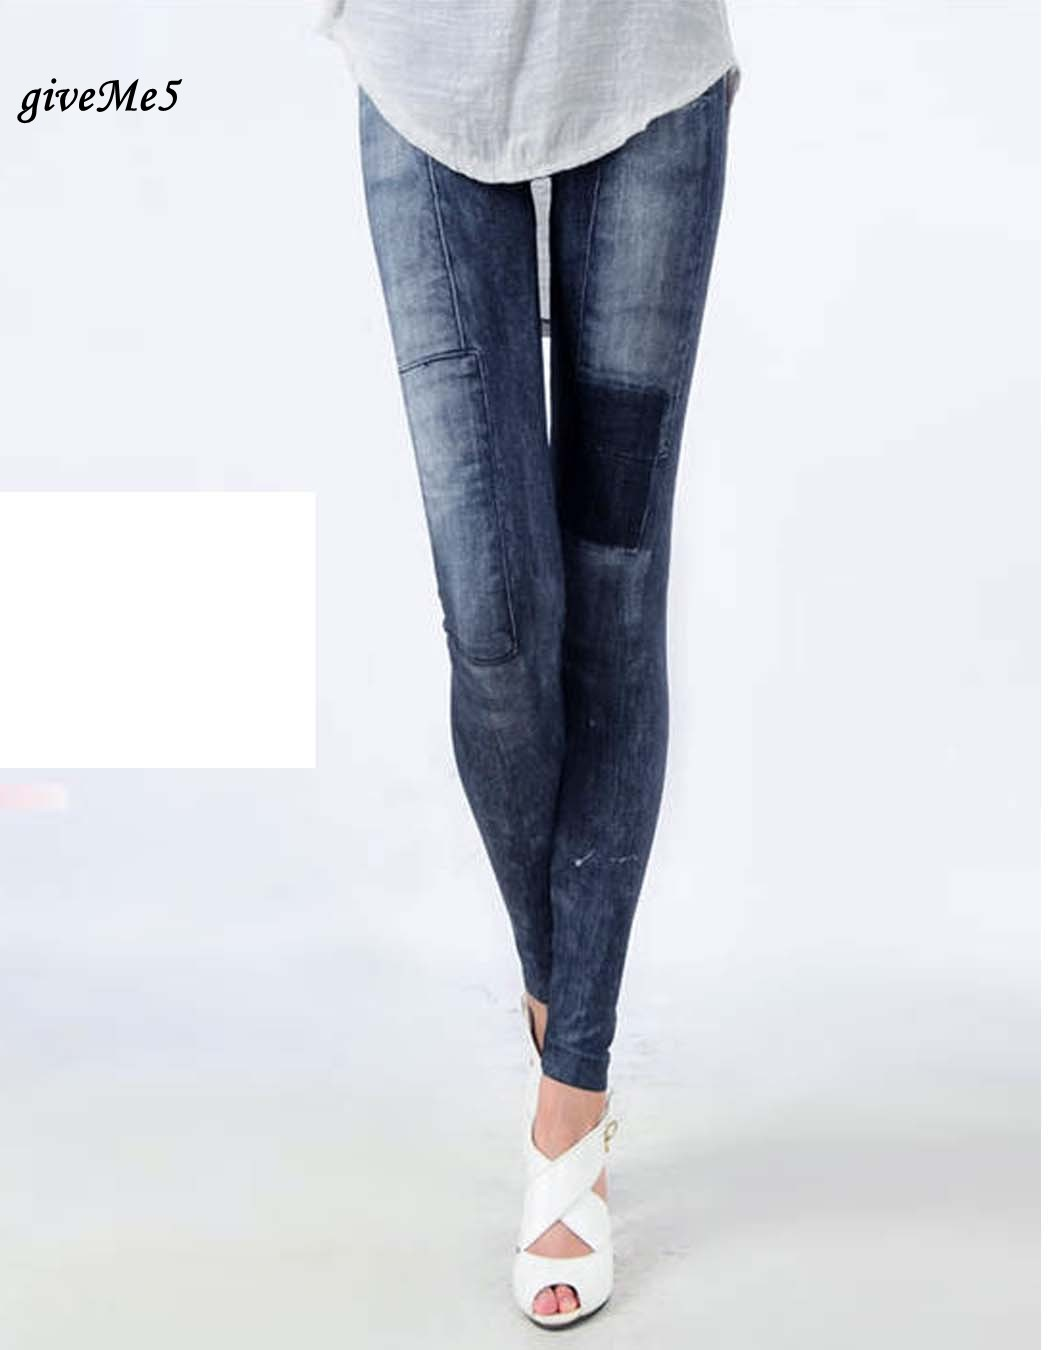 Dirt Cheap Women's Jeggings Stretch Skinny Leggings Leg Wear Pencil Pants Casual Jeans 30